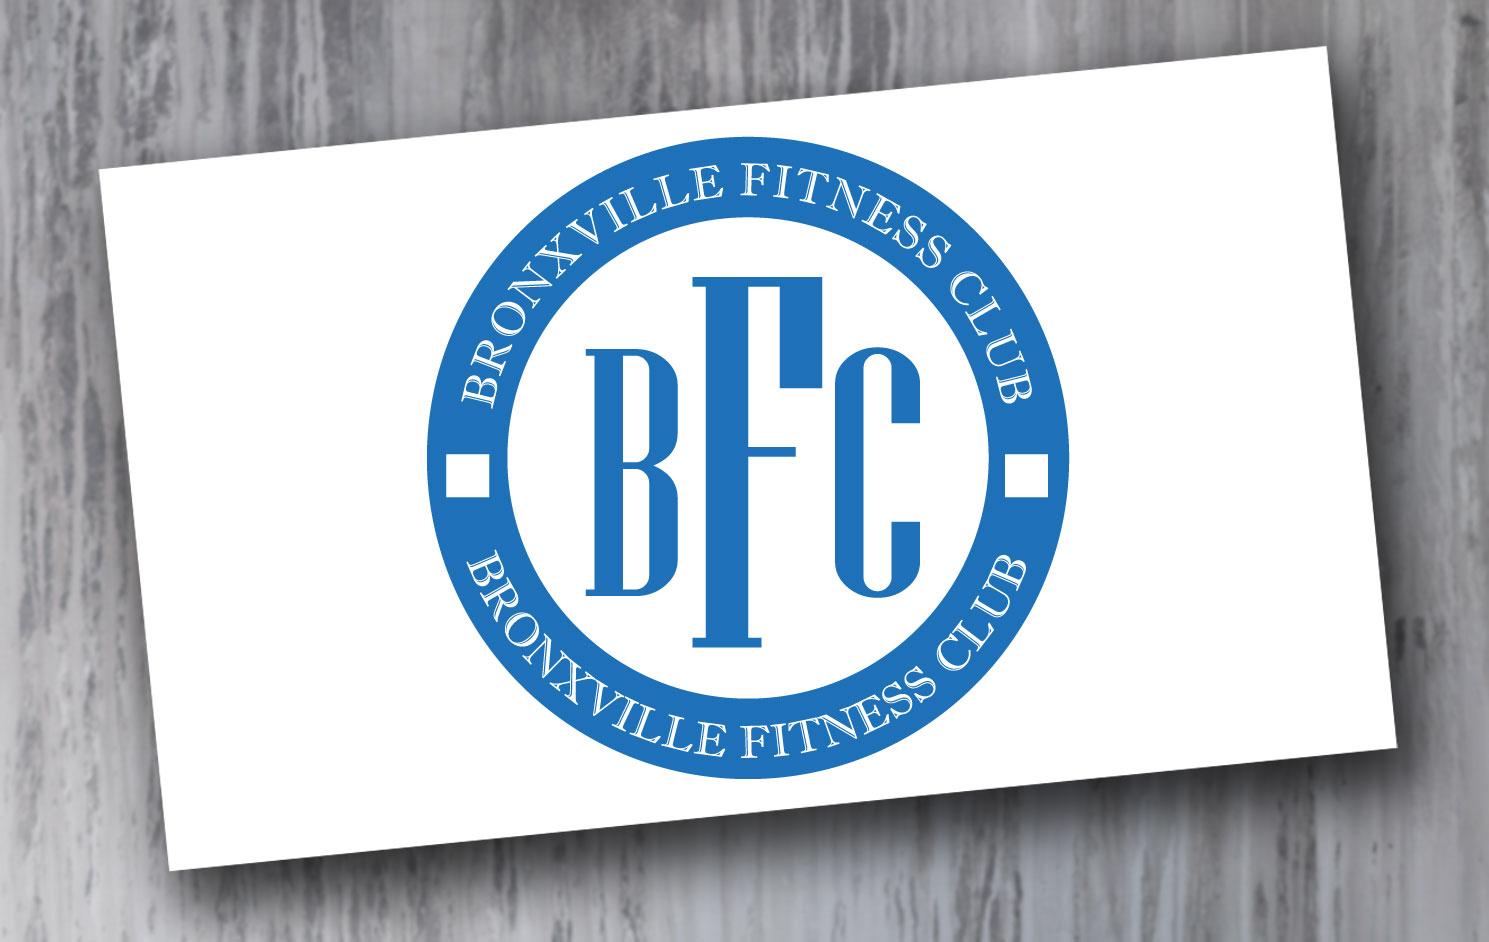 broxvillefitnessclub